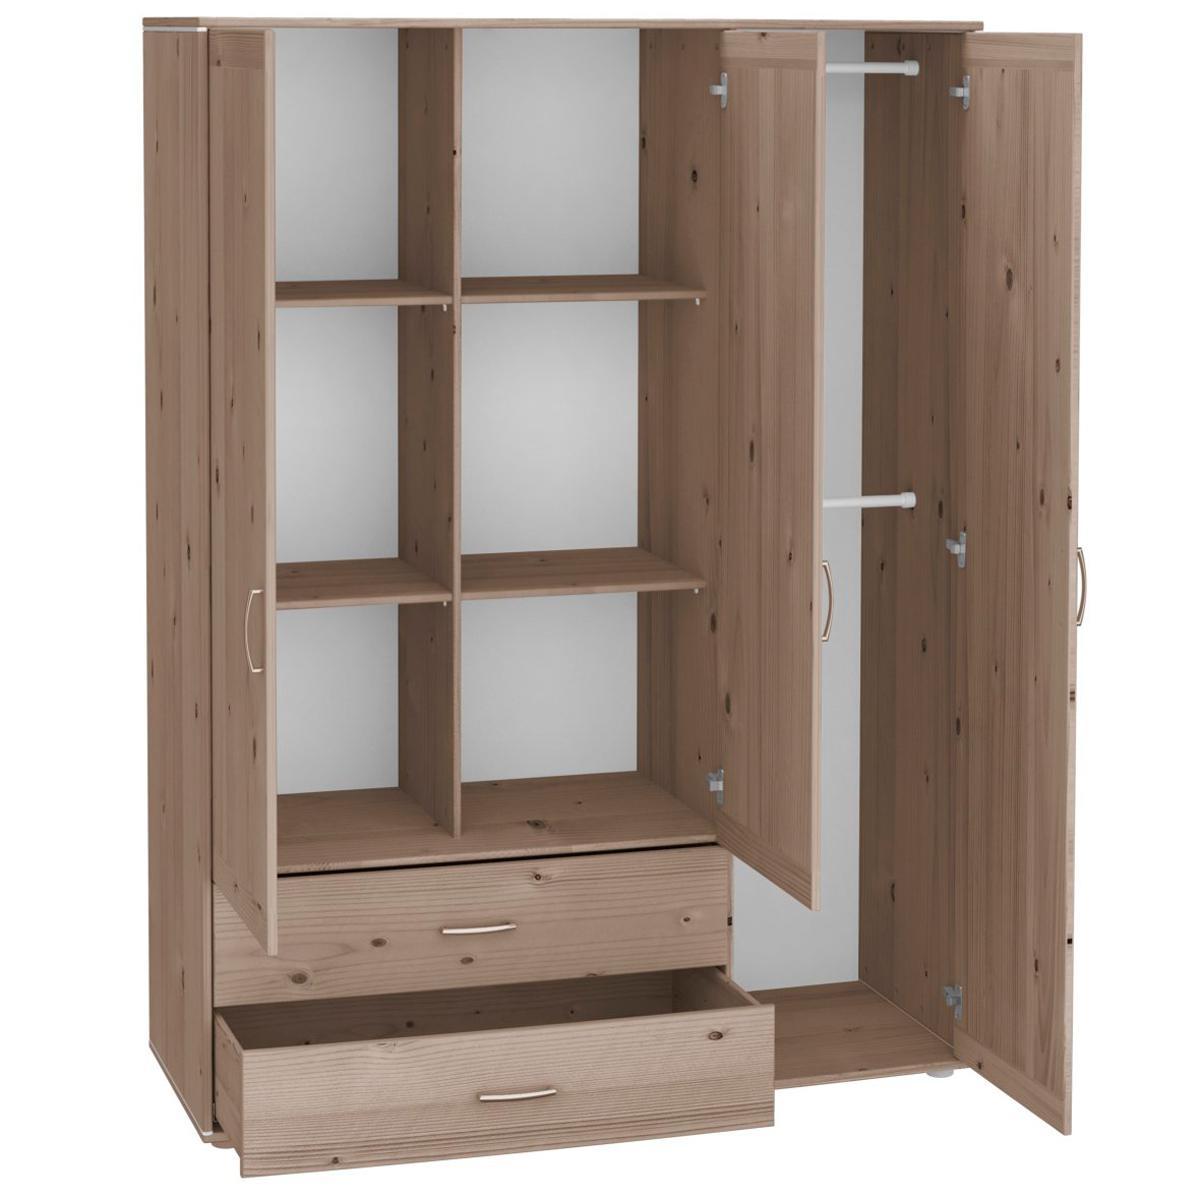 Armario infantil extra alto 3 puertas 2 cajones 4 estantes 2 barras NEW CLASSIC Flexa terra - terra - blanco